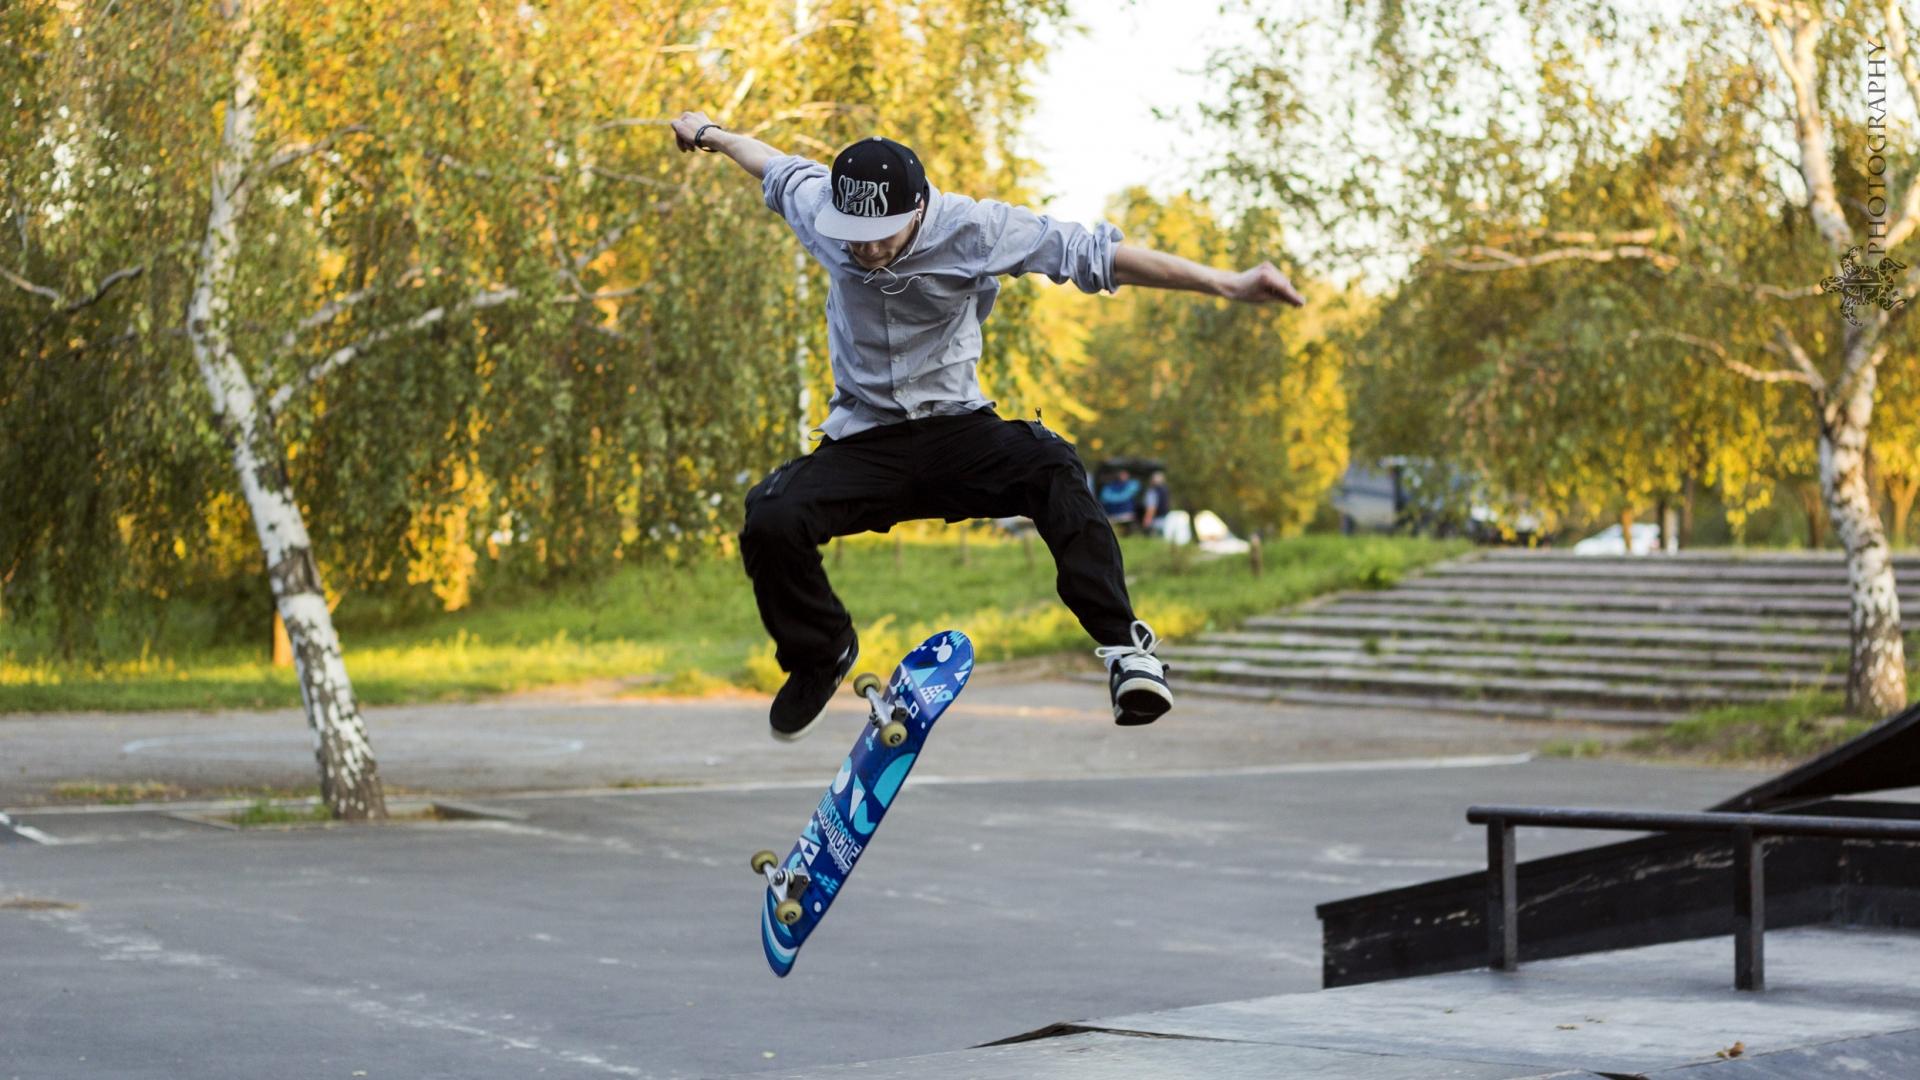 Trucos con skate - 1920x1080